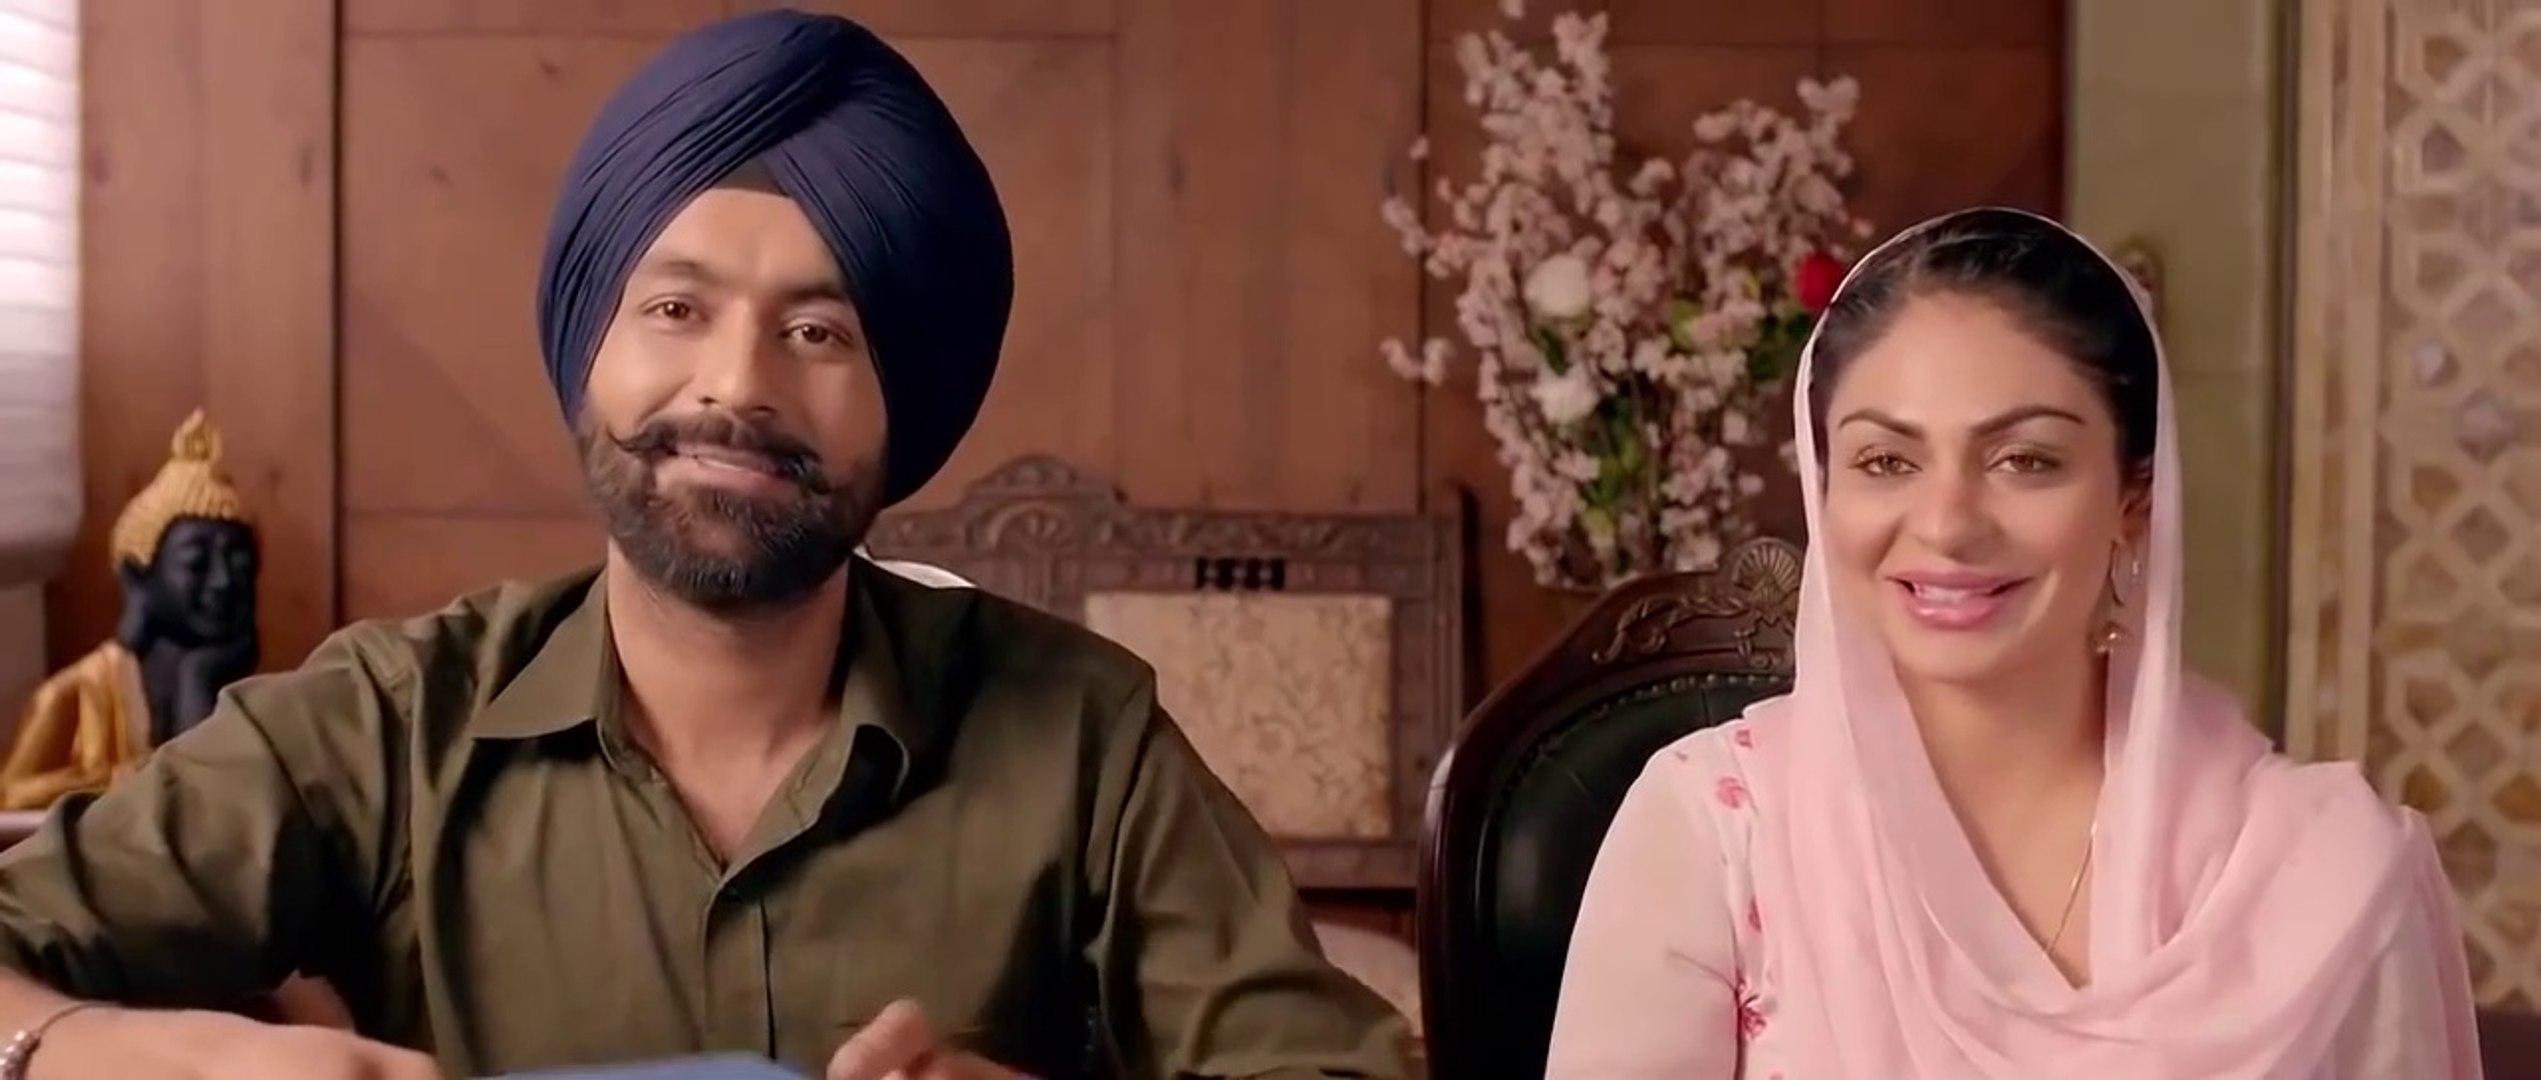 Uda Aida Tarsem Jassar Neeru Bajwa Part 2 Full Punjabi Movies Hd New Punjabi Movies 2020 Full Movies Video Dailymotion